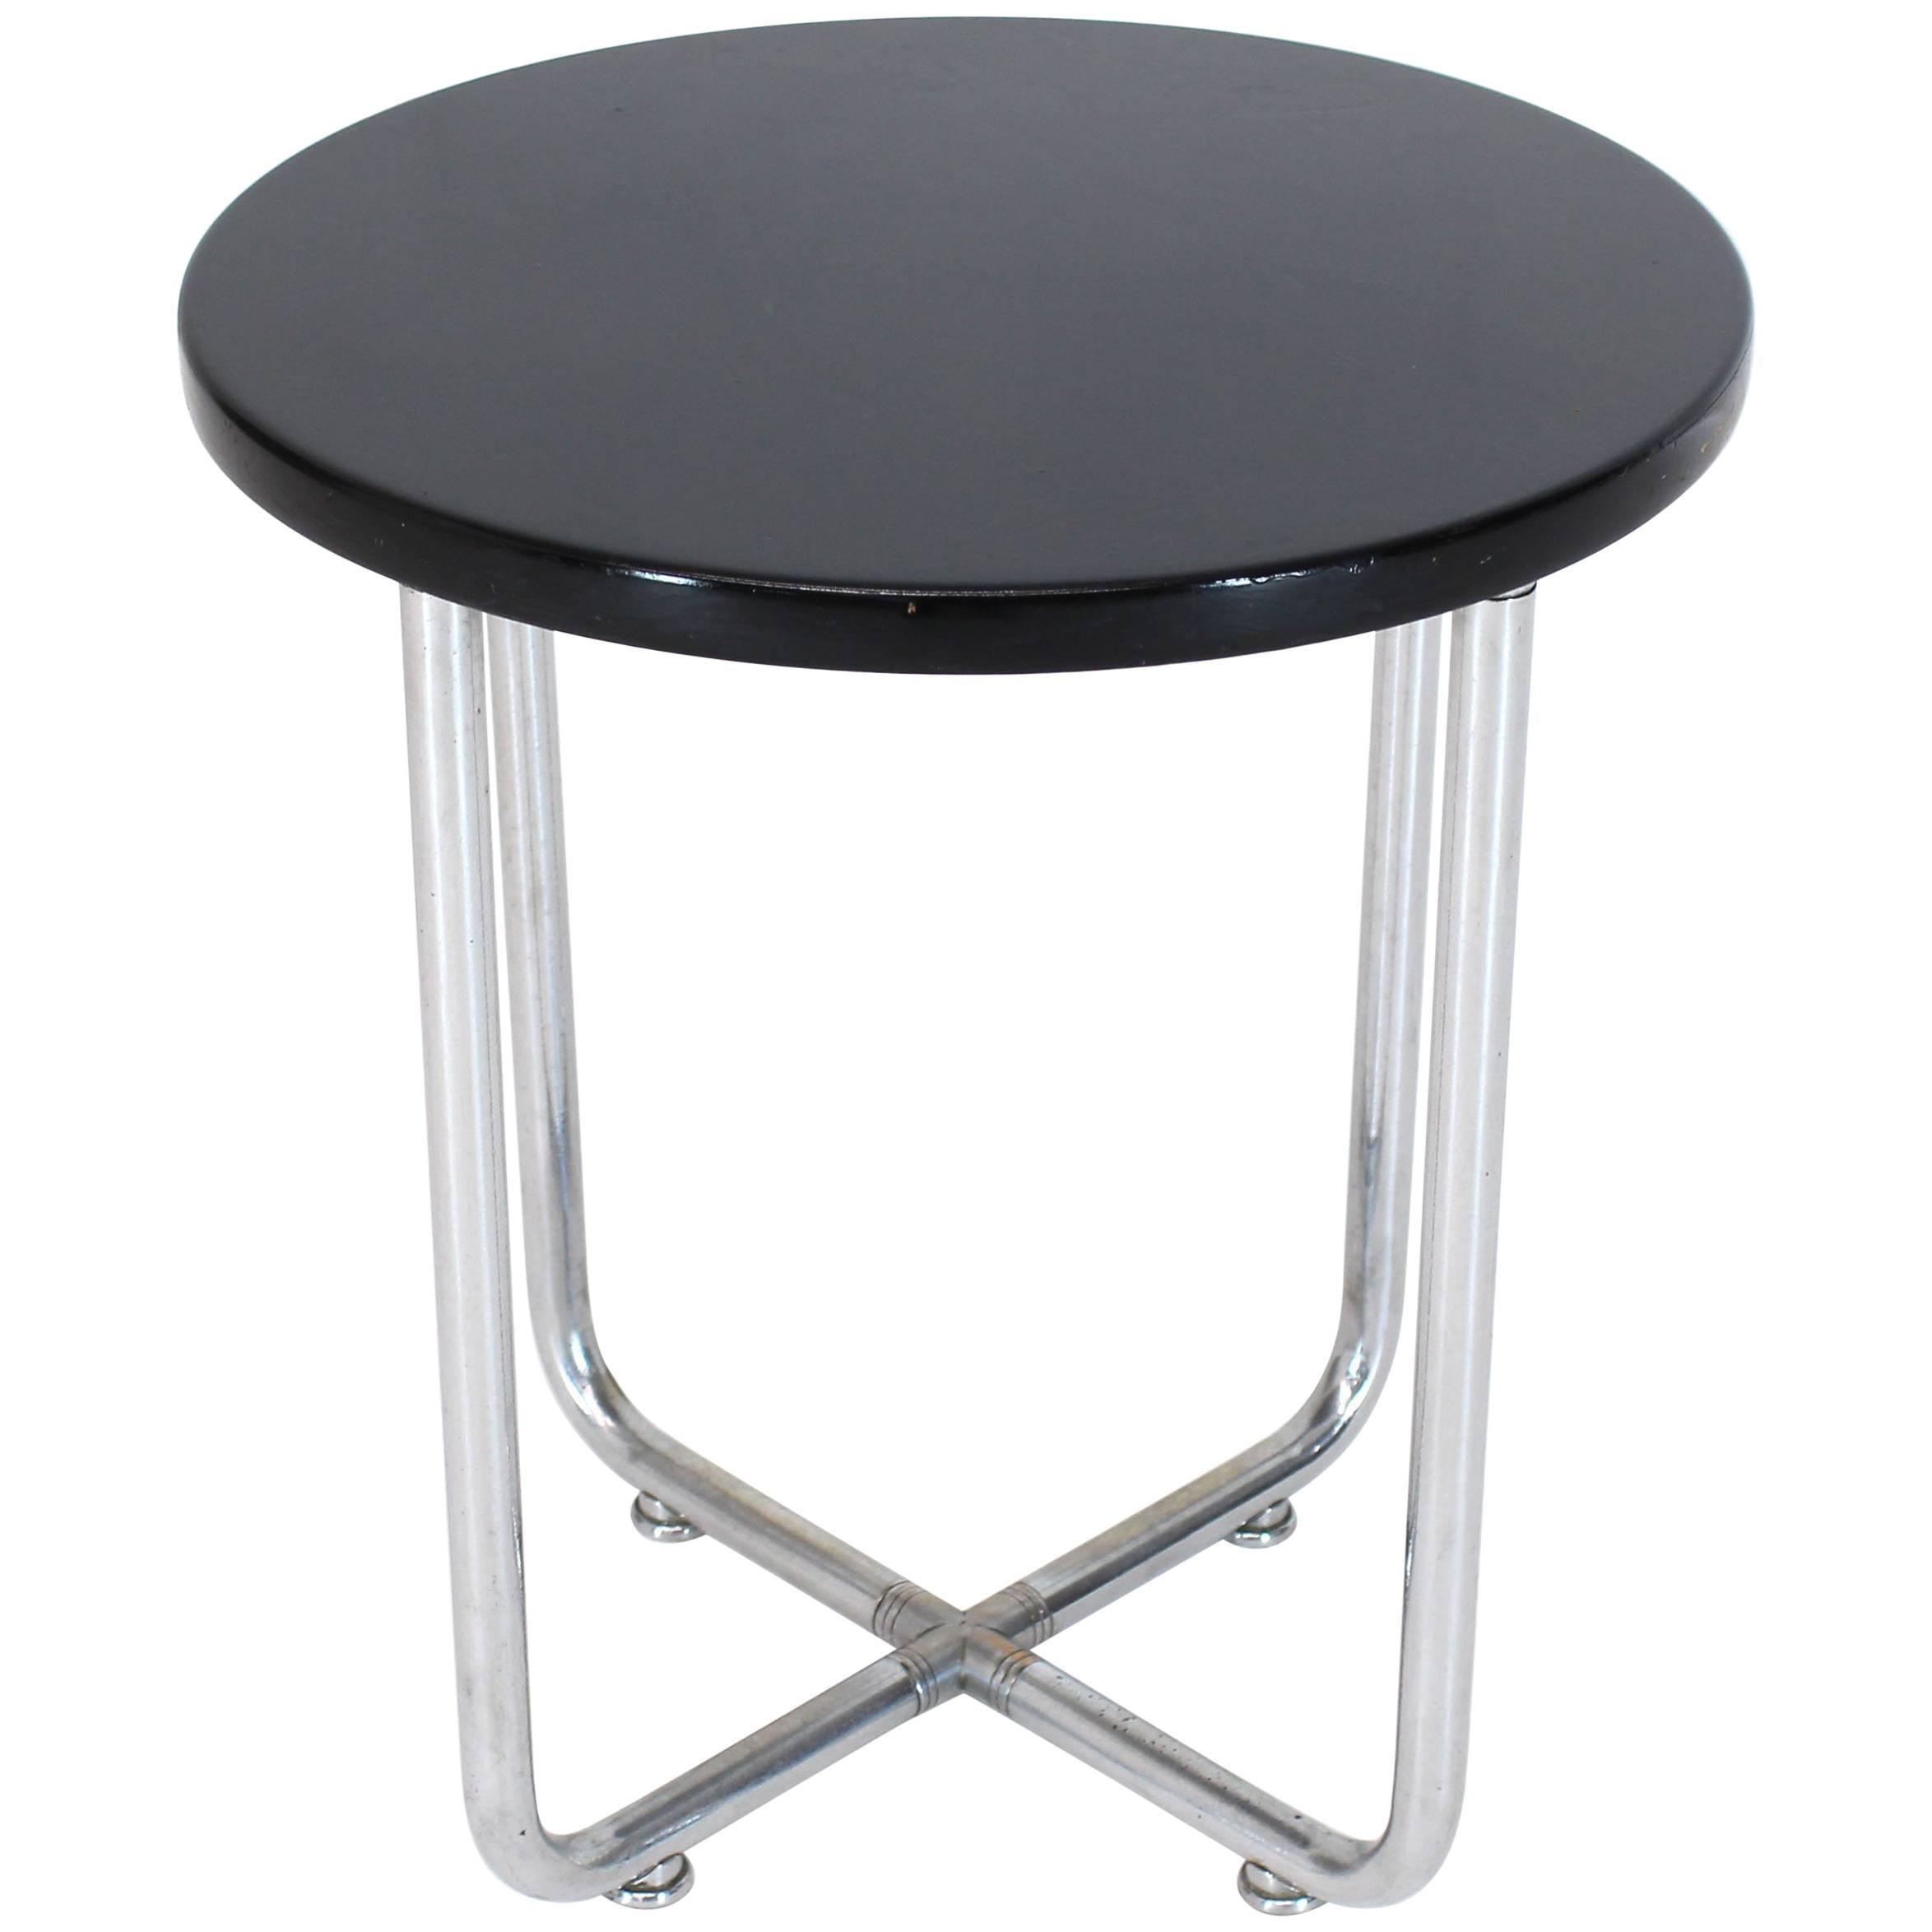 Josef Hofmann Art Deco Bauhaus Round Side Occasional Table Stand